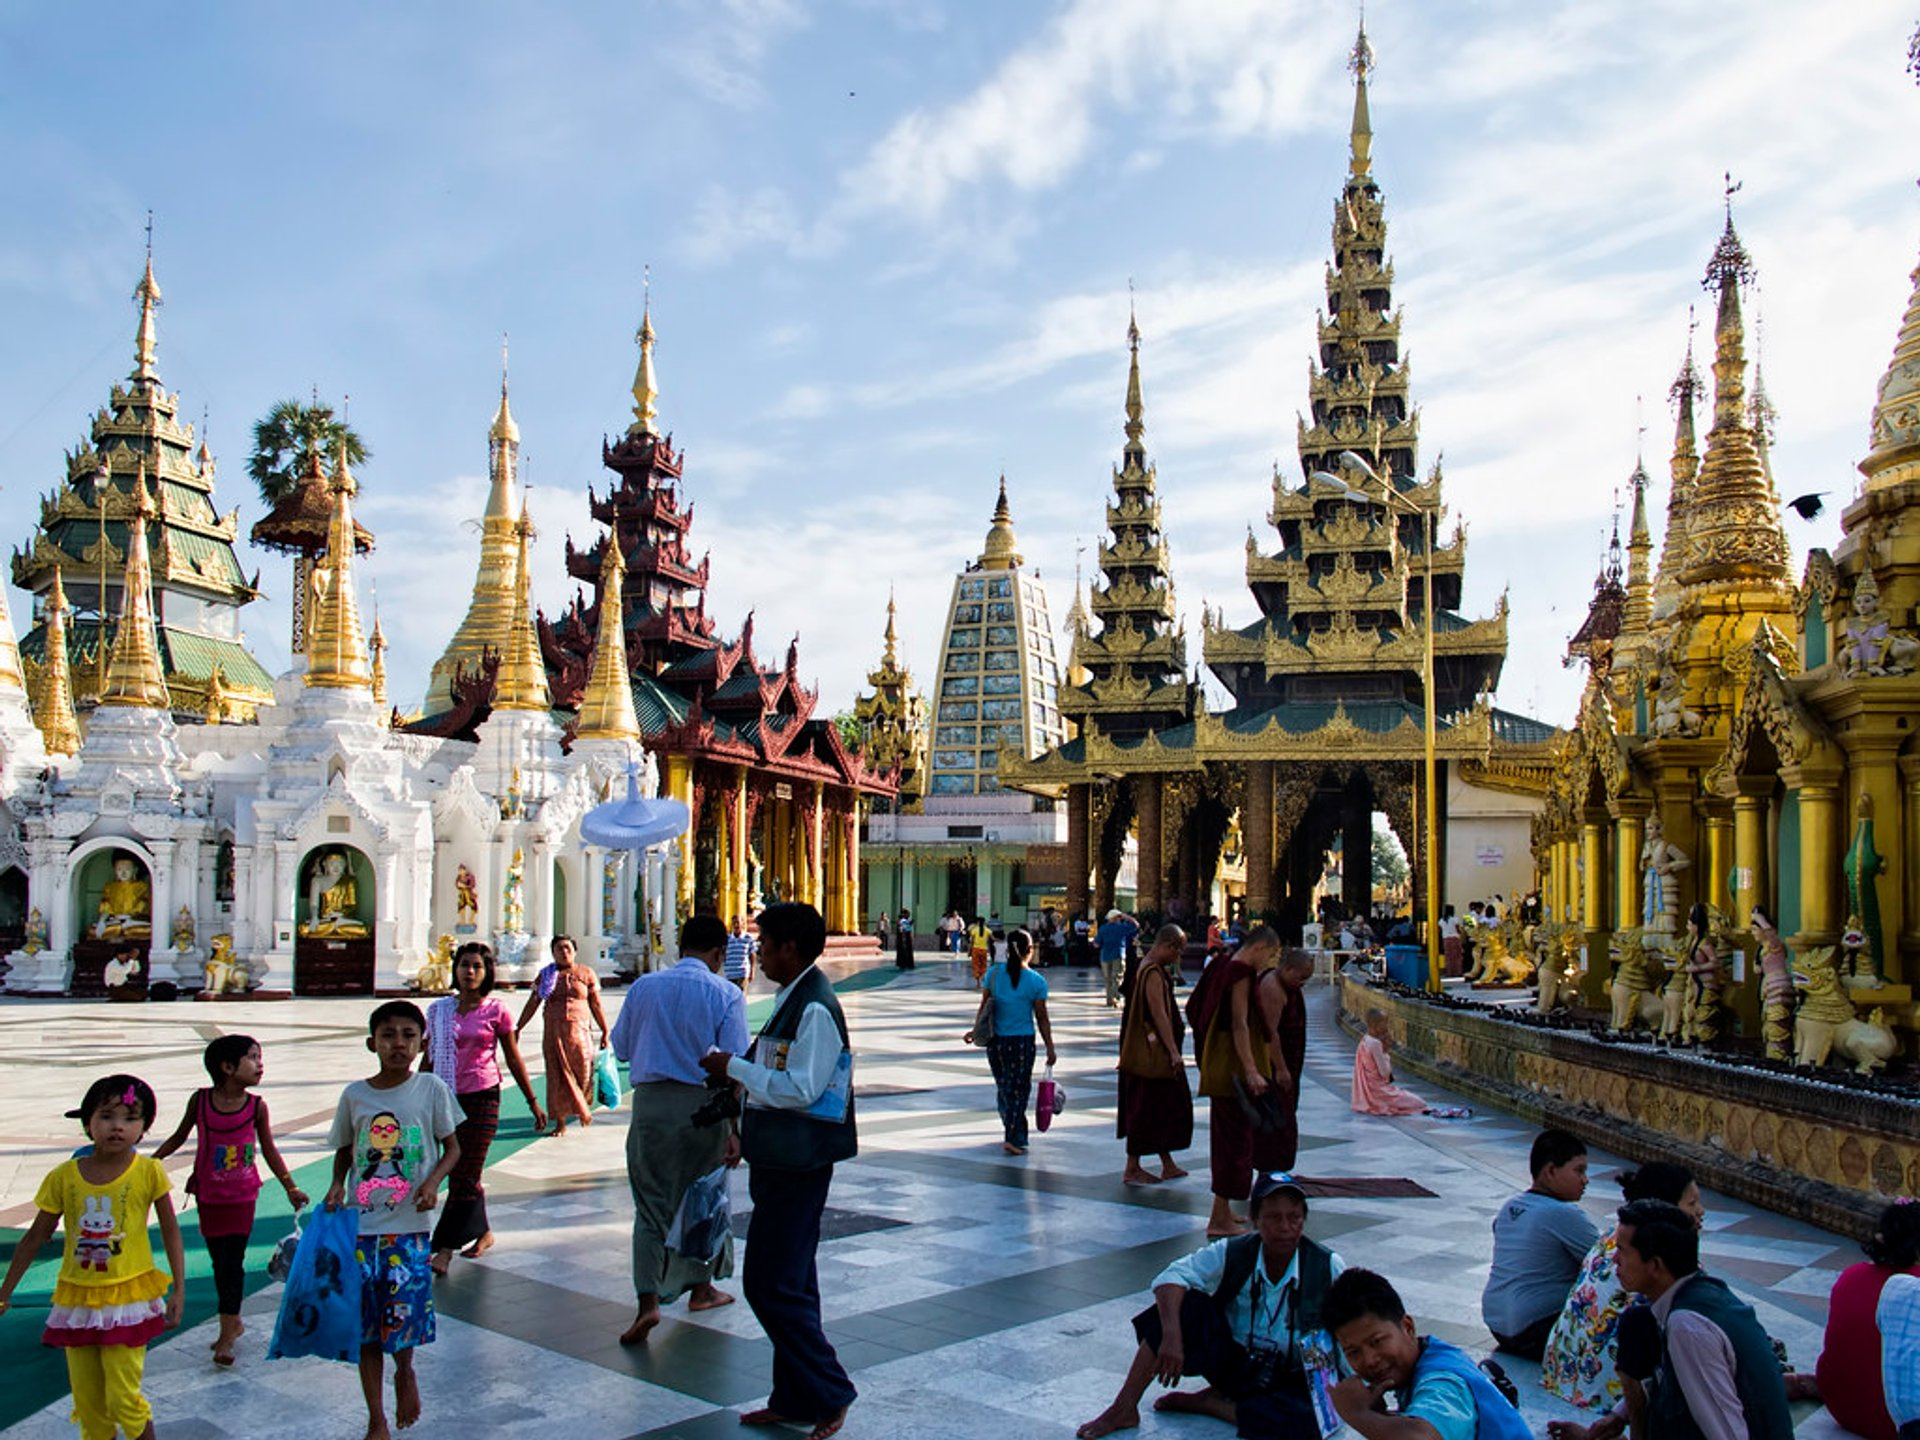 Shwedagon Pagoda 2020